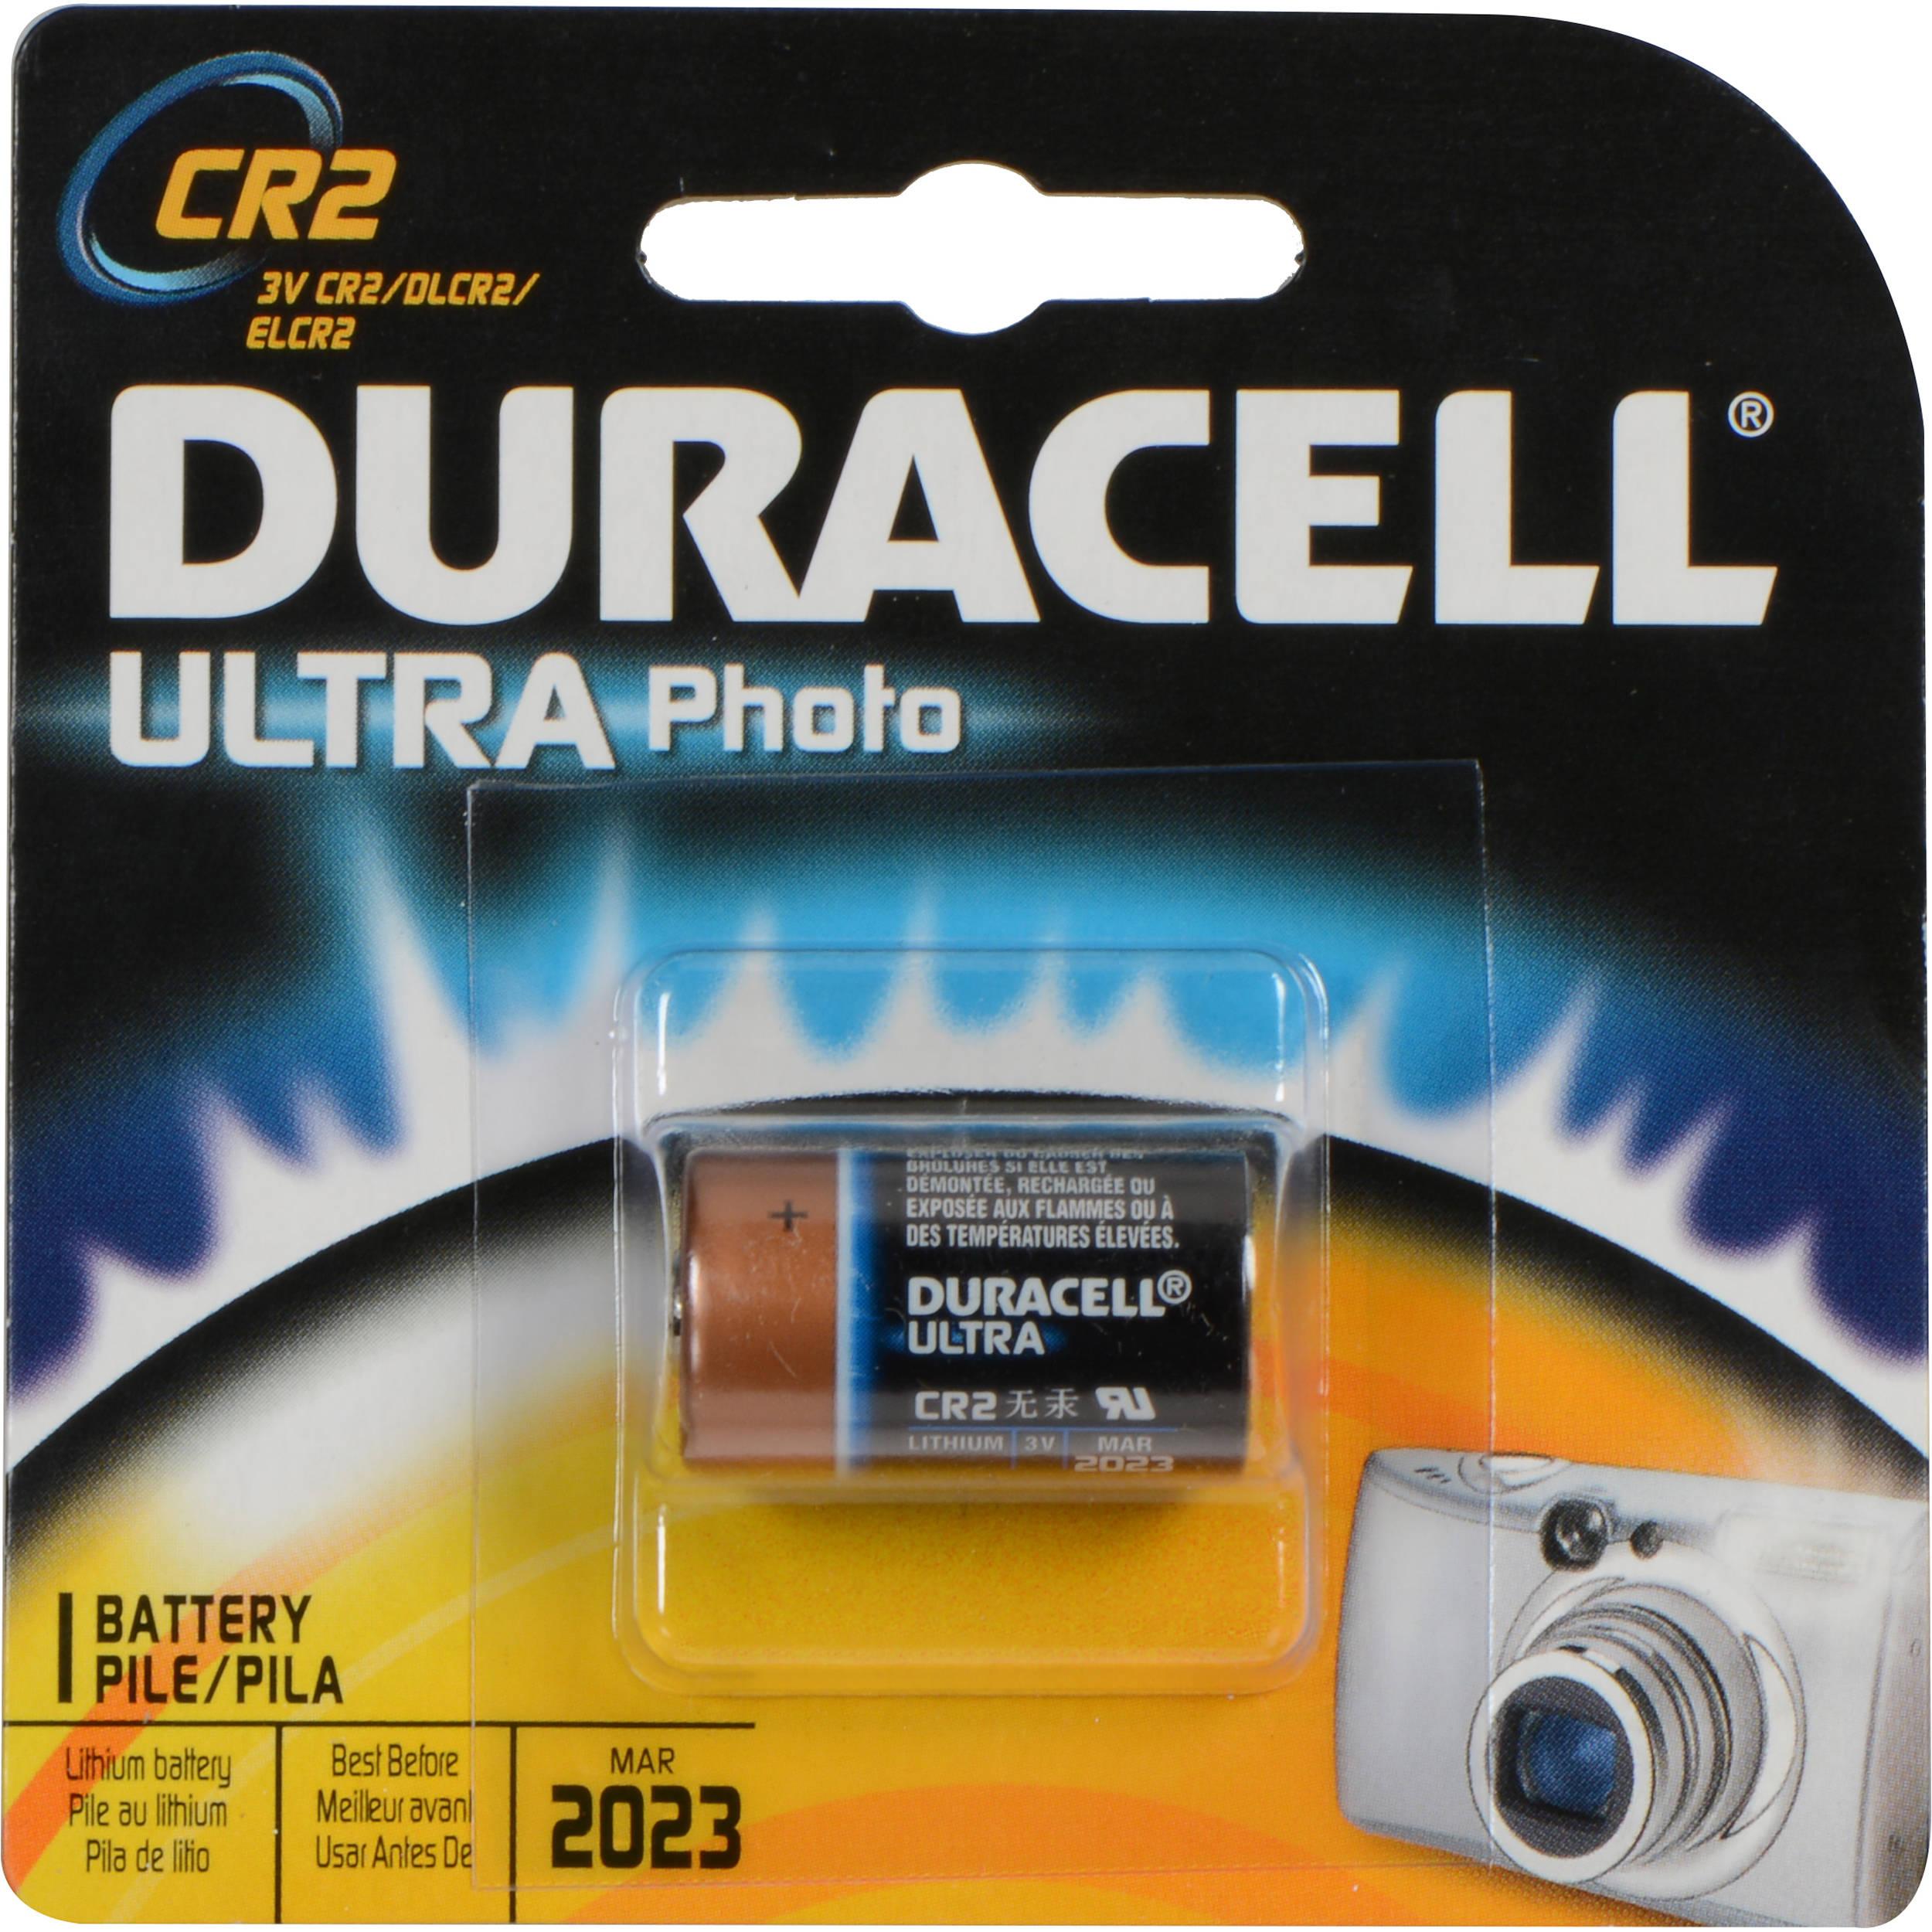 Duracell ultra photo 3v cr2 lithium battery dlcr2bpk b h photo - Pile cr2 3v ...